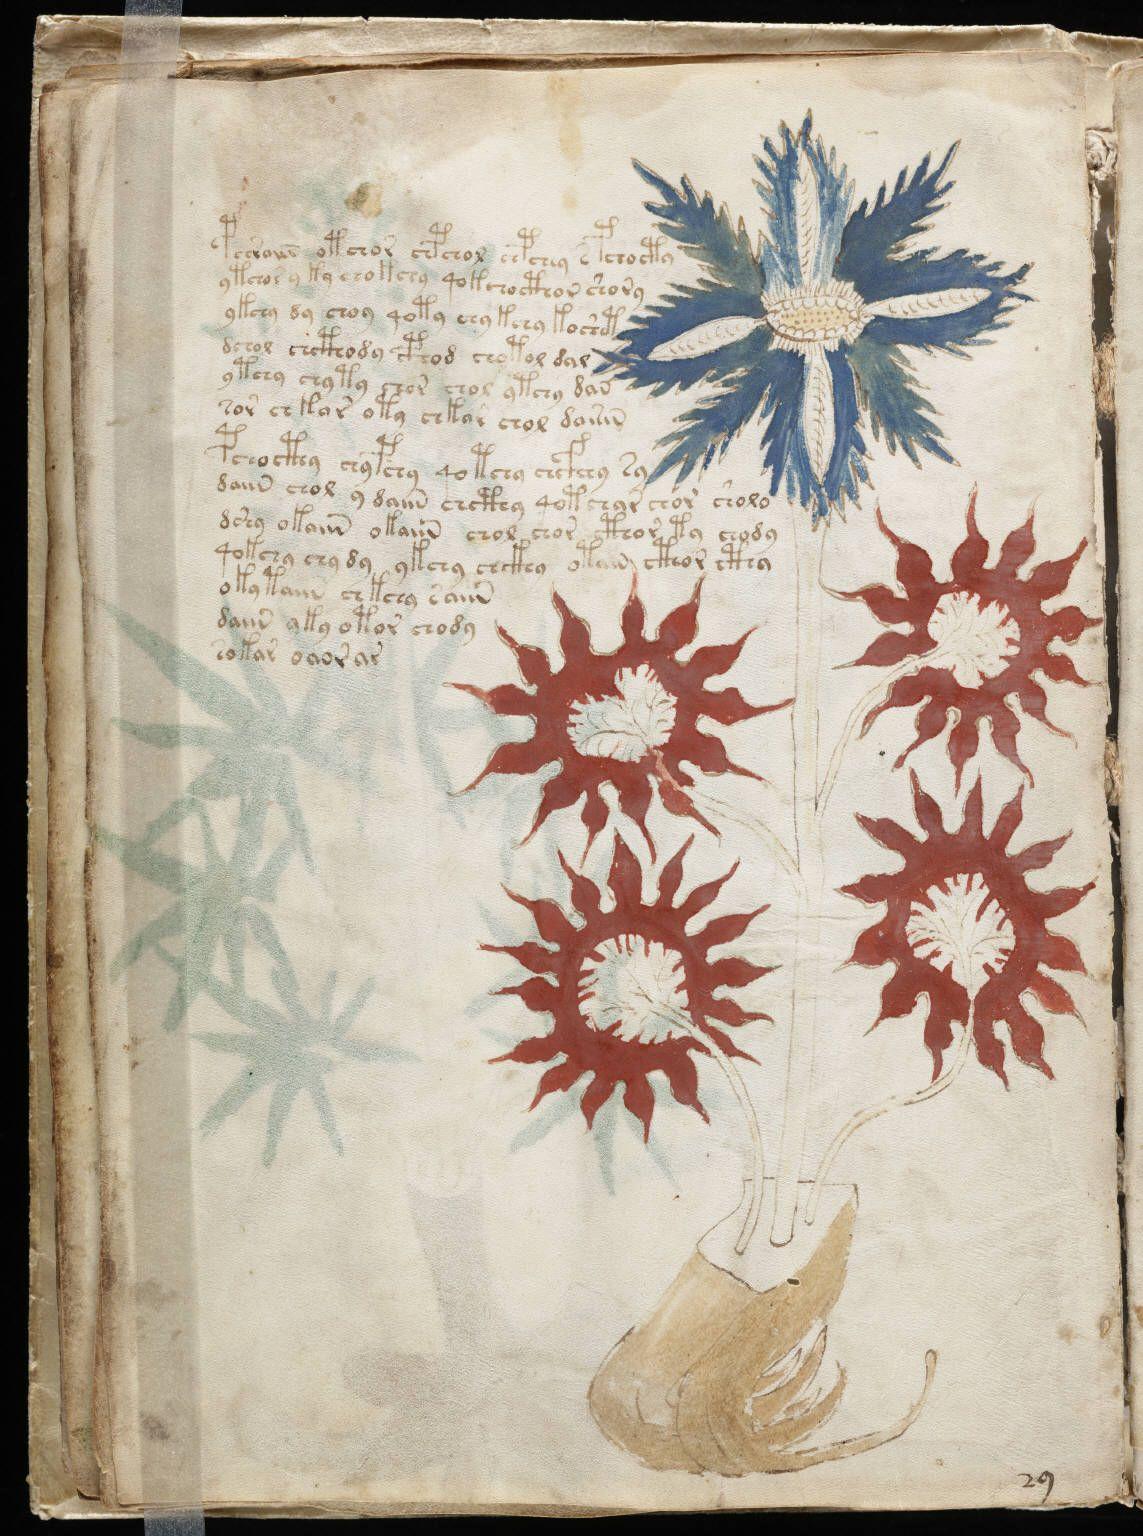 pg32 of the mysterious Voynich manuscript